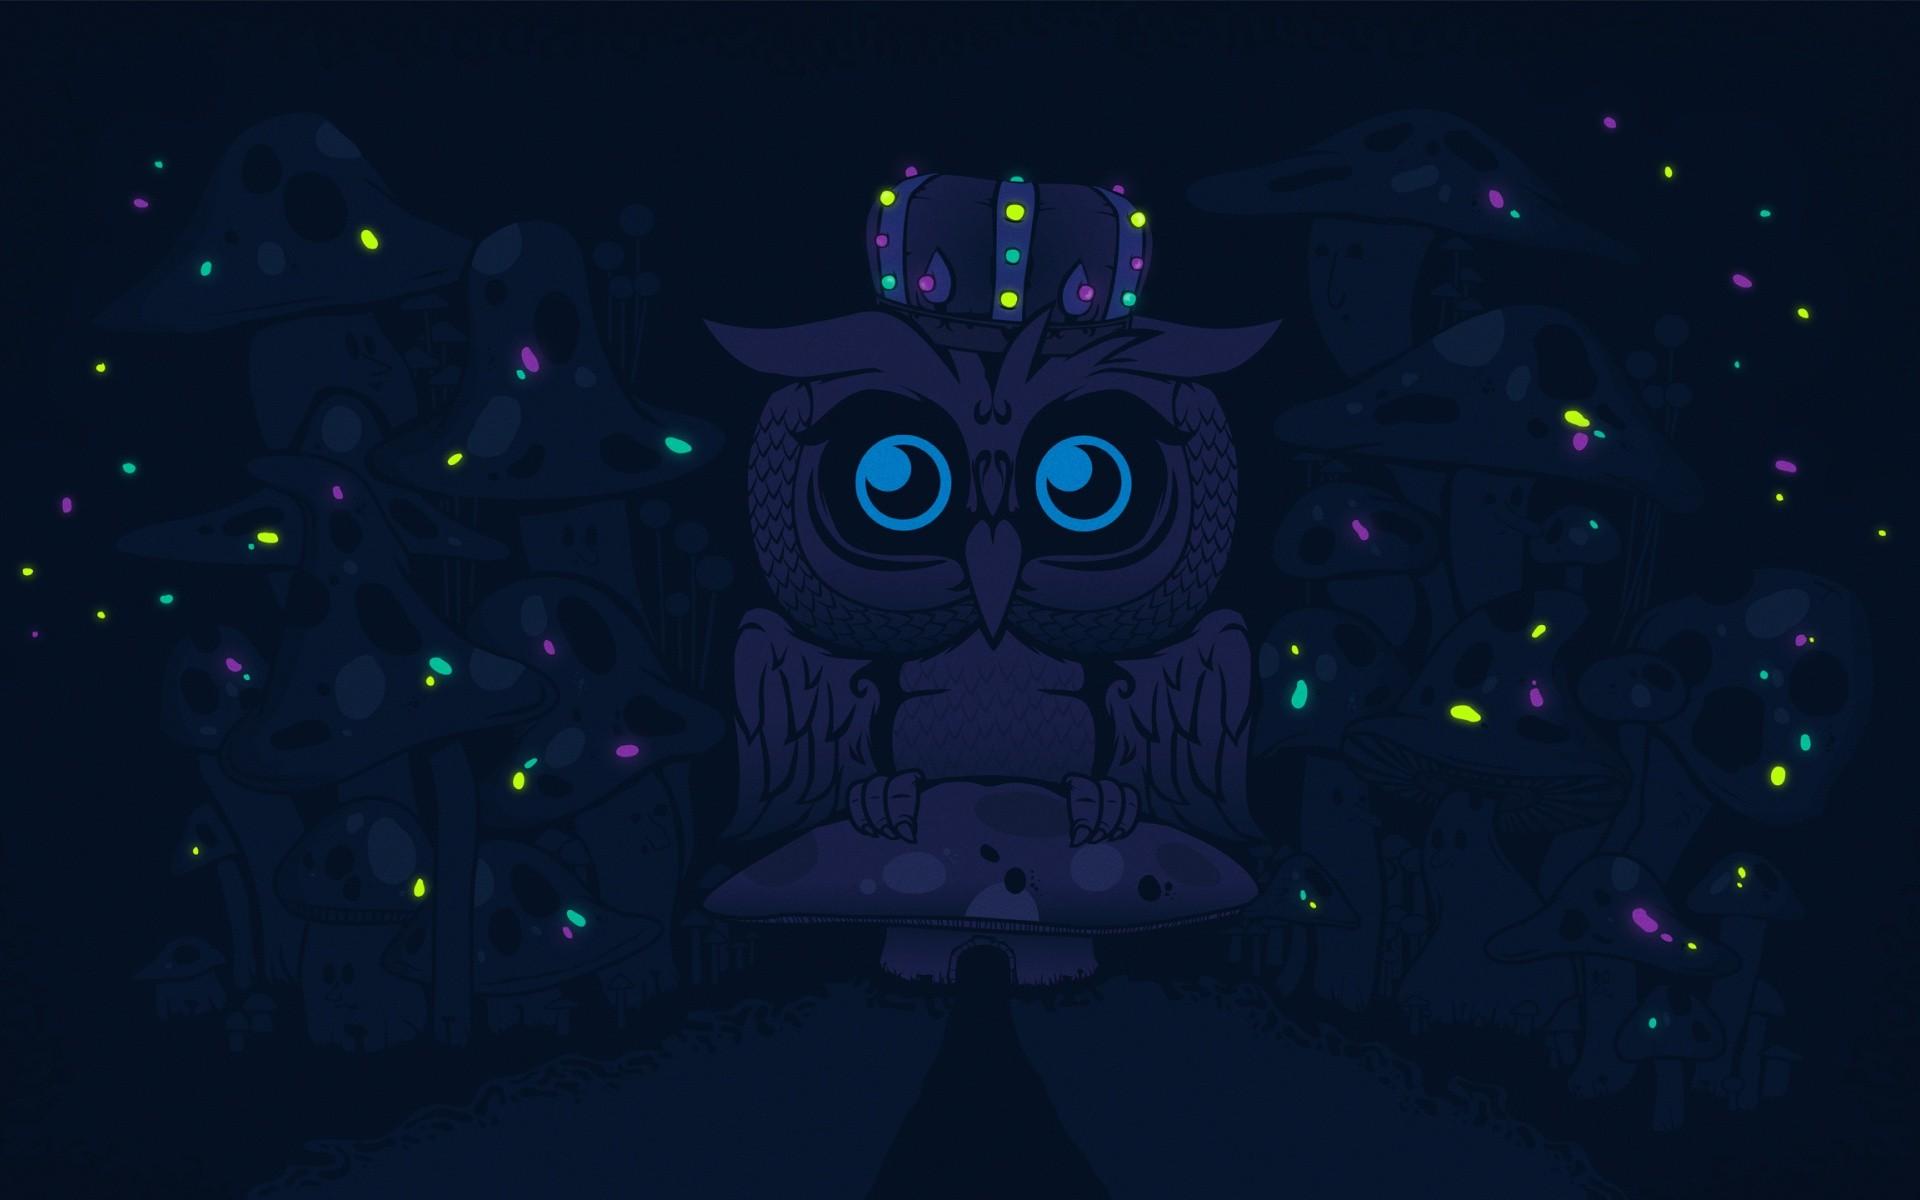 Illustration Digital Art Night Owl Darkness Screenshot 1920x1200 Px Computer Wallpaper